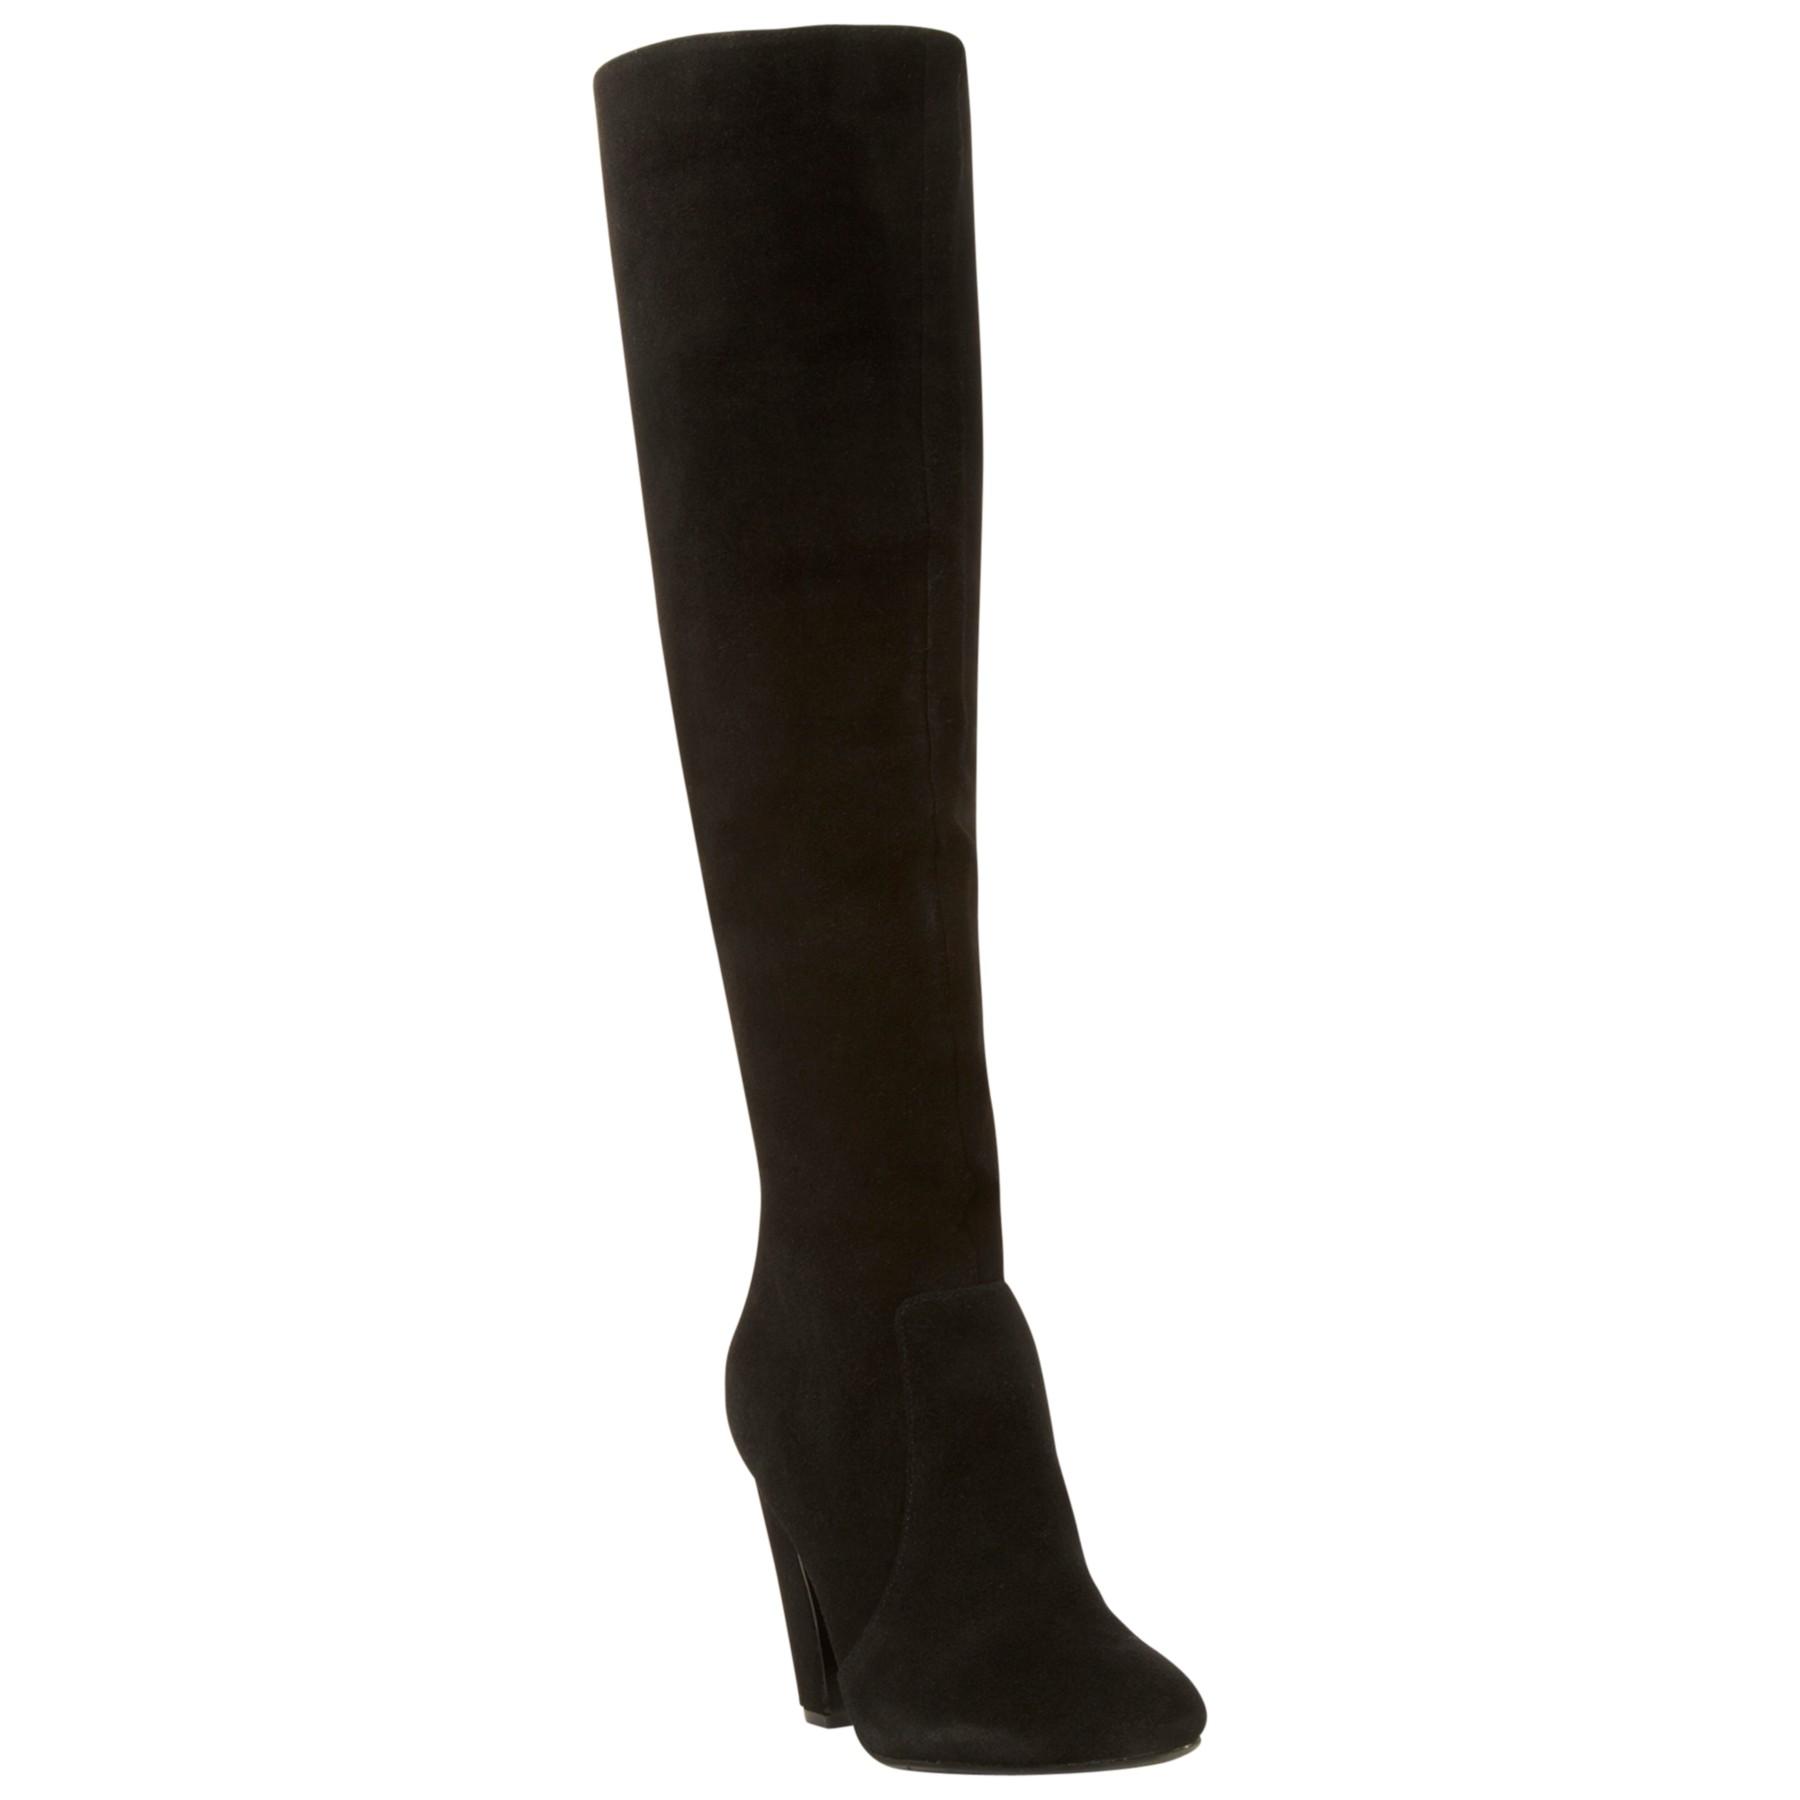 steve madden priscilla suede knee high boots in black lyst